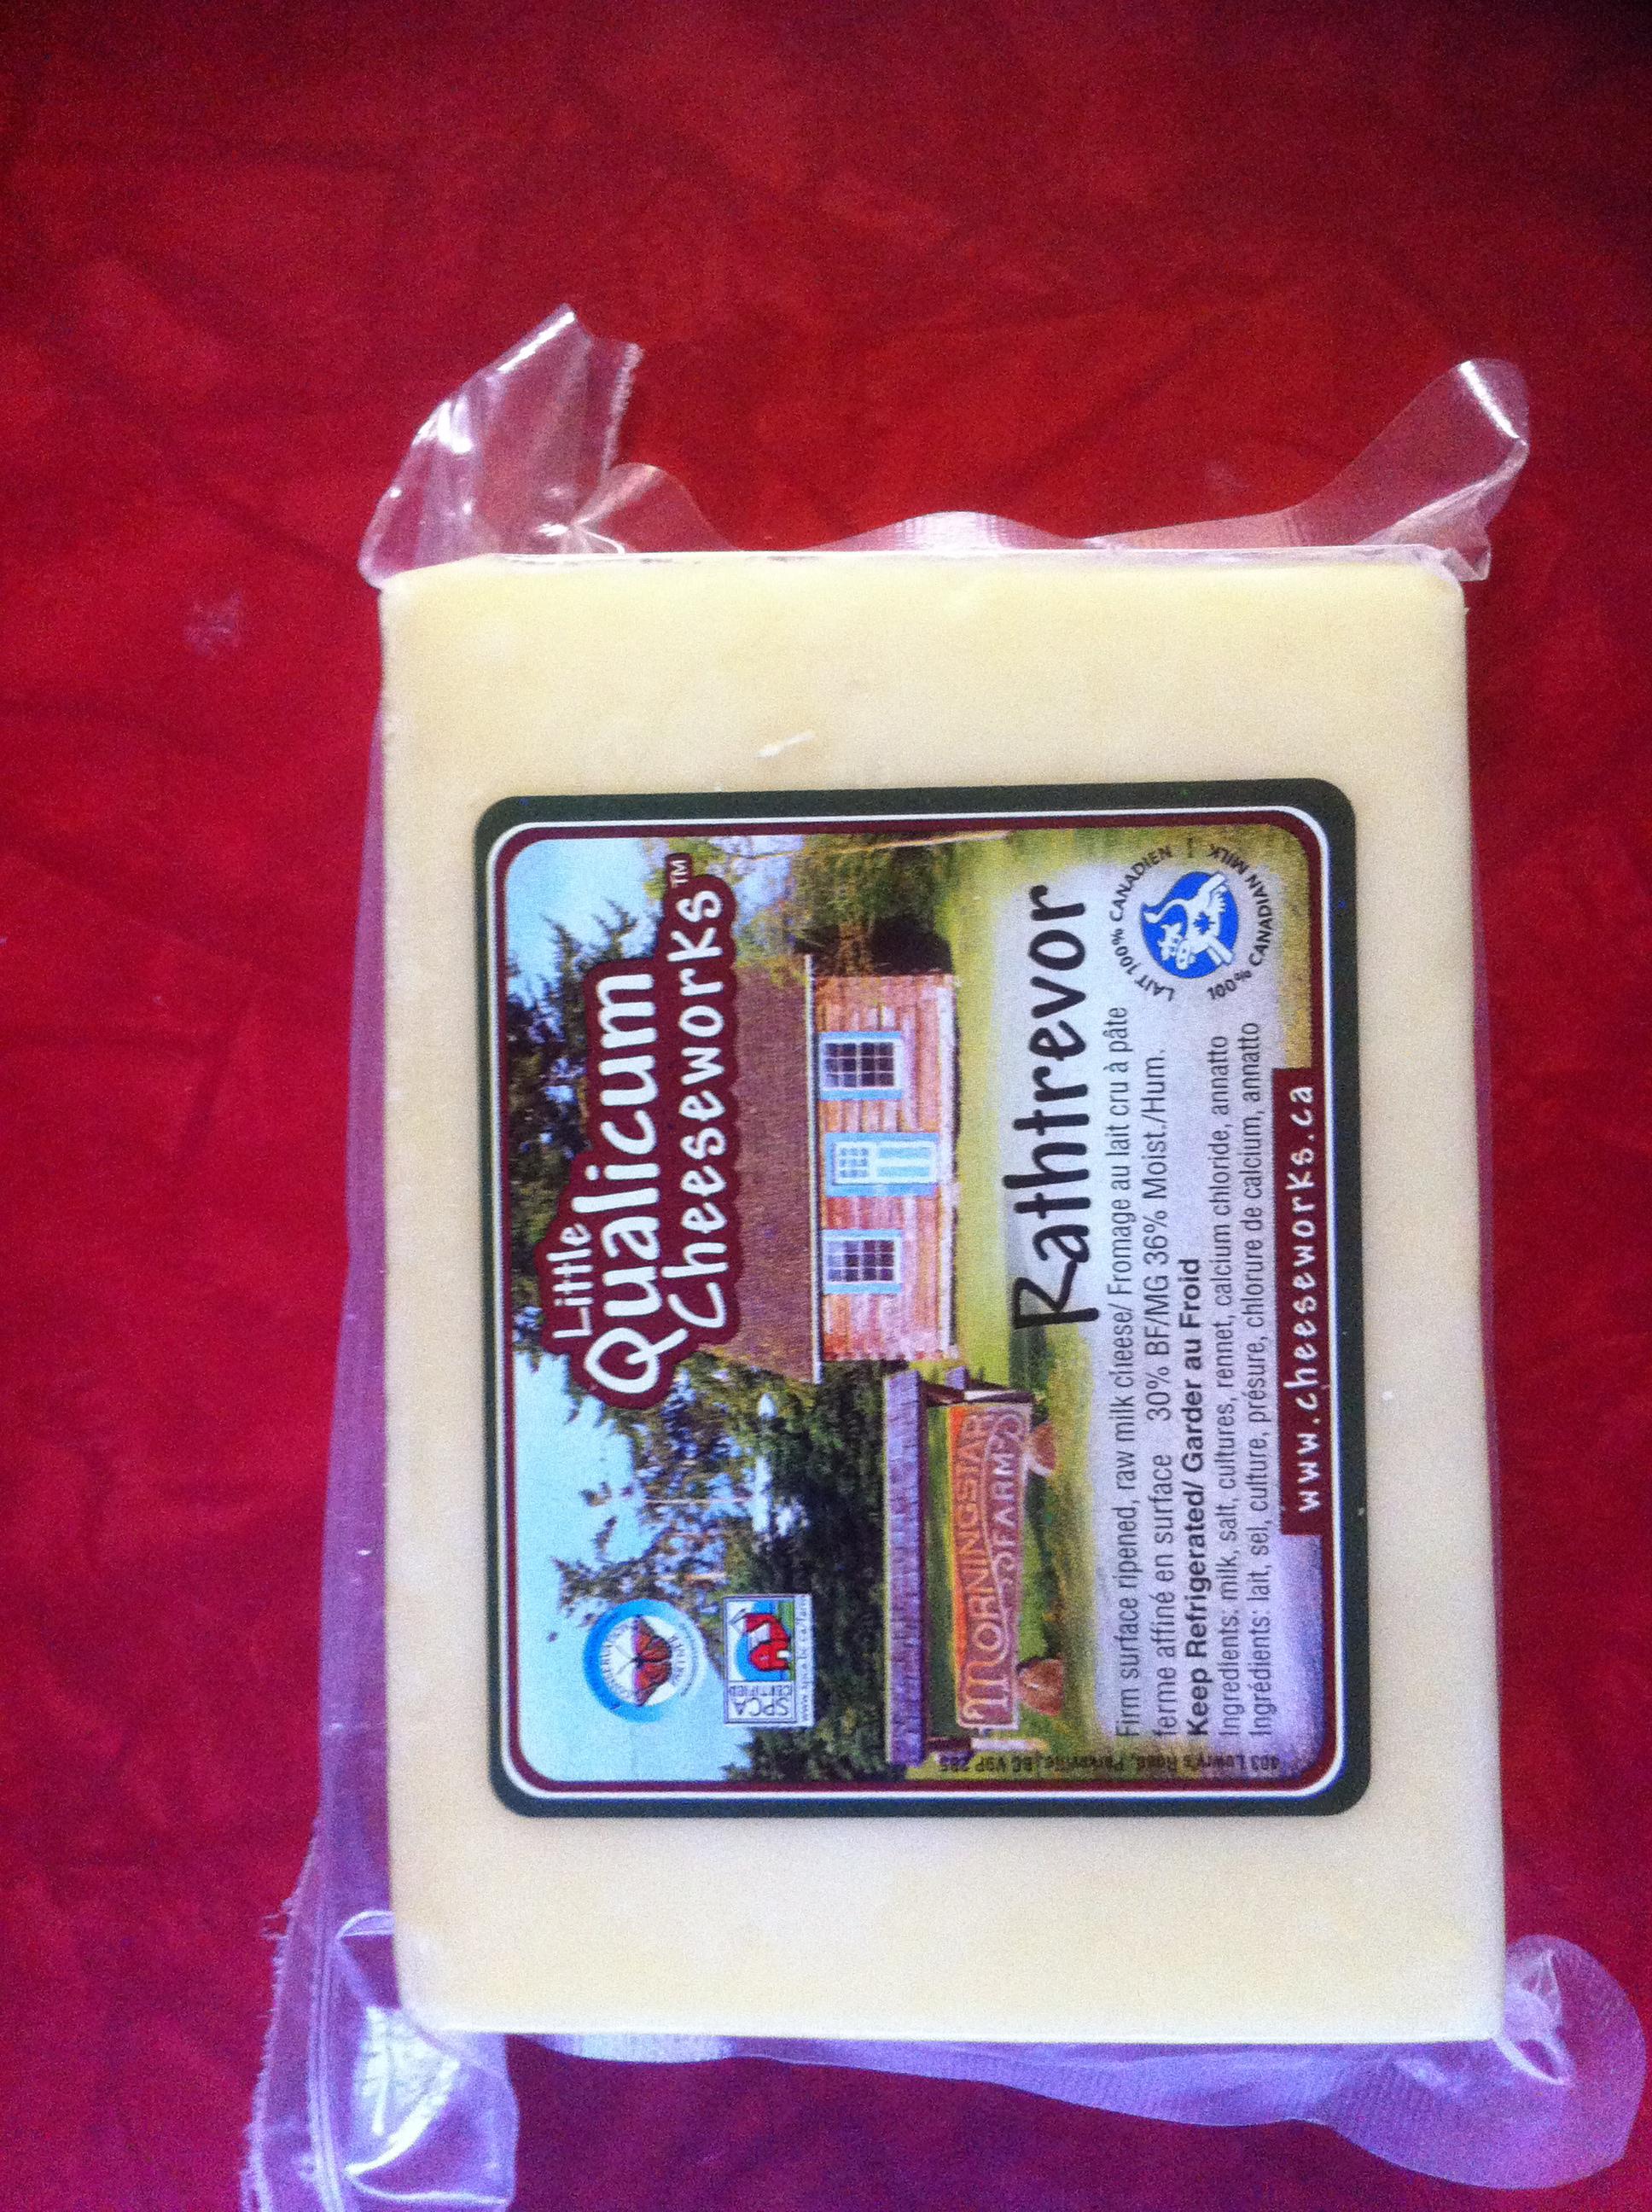 Little Qualicum | My Blog of Cheese